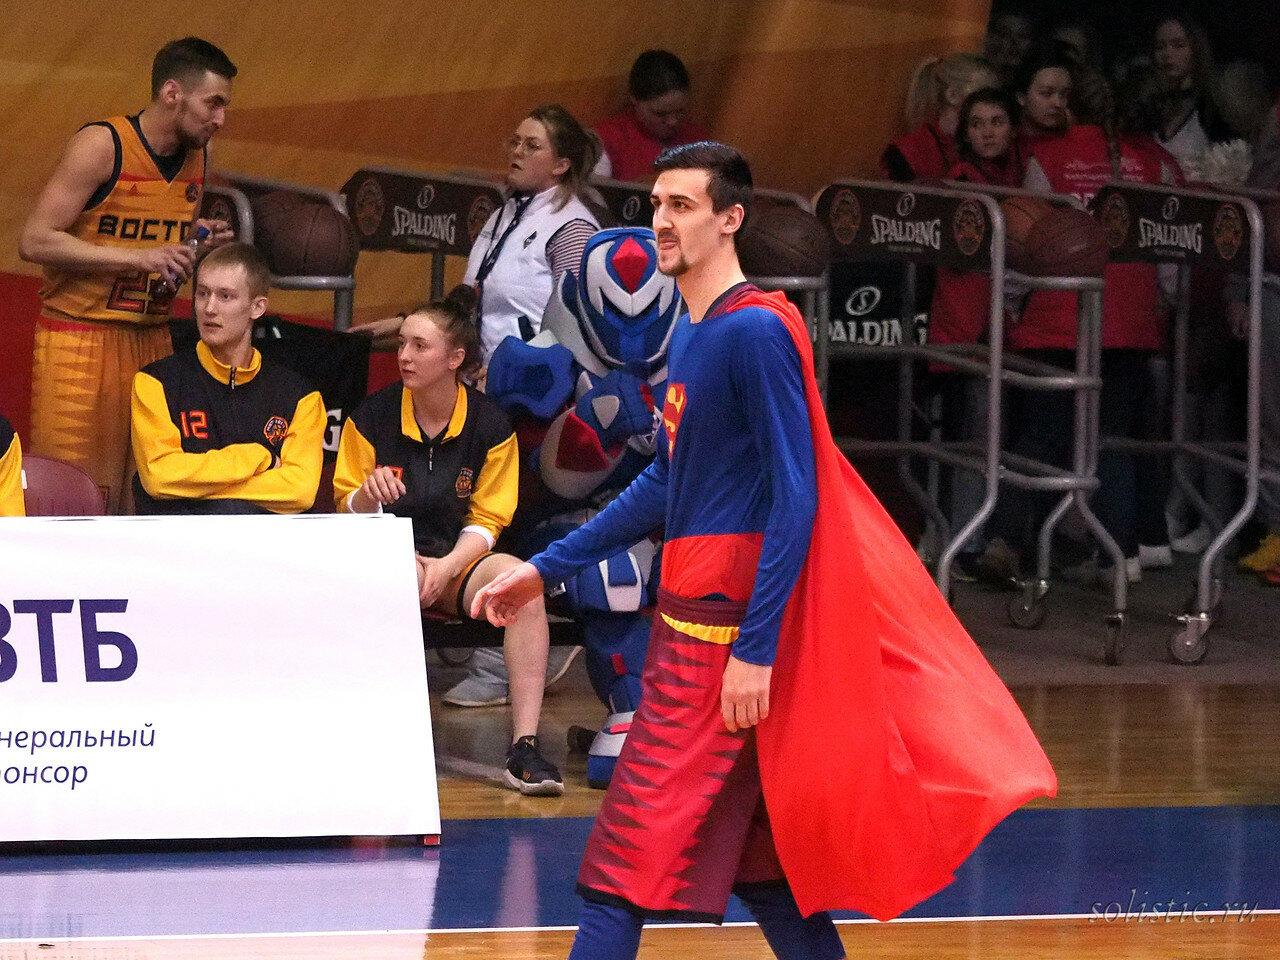 79 Матч звезд АСБ 2018 (ассоциации студенческого баскетбола)